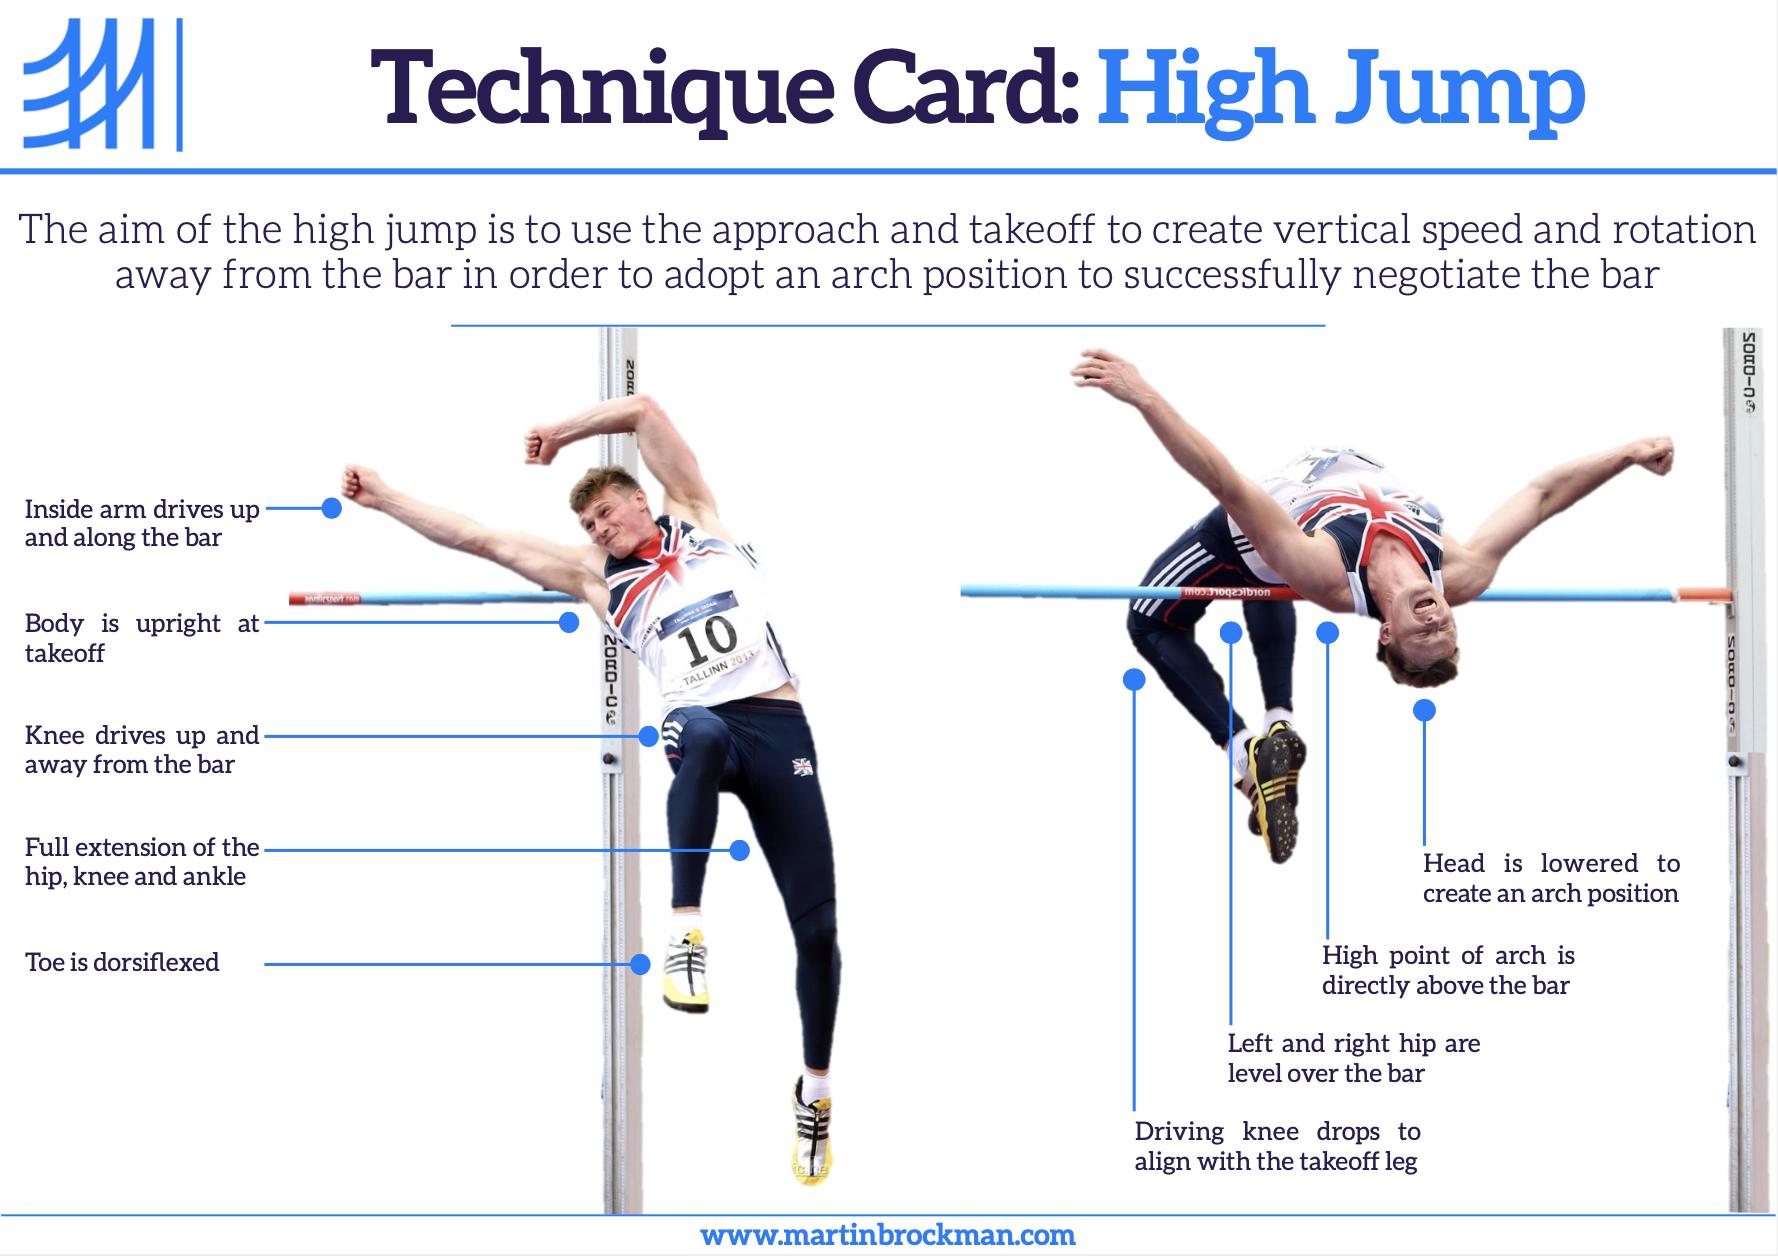 Technique Cards - High Jump